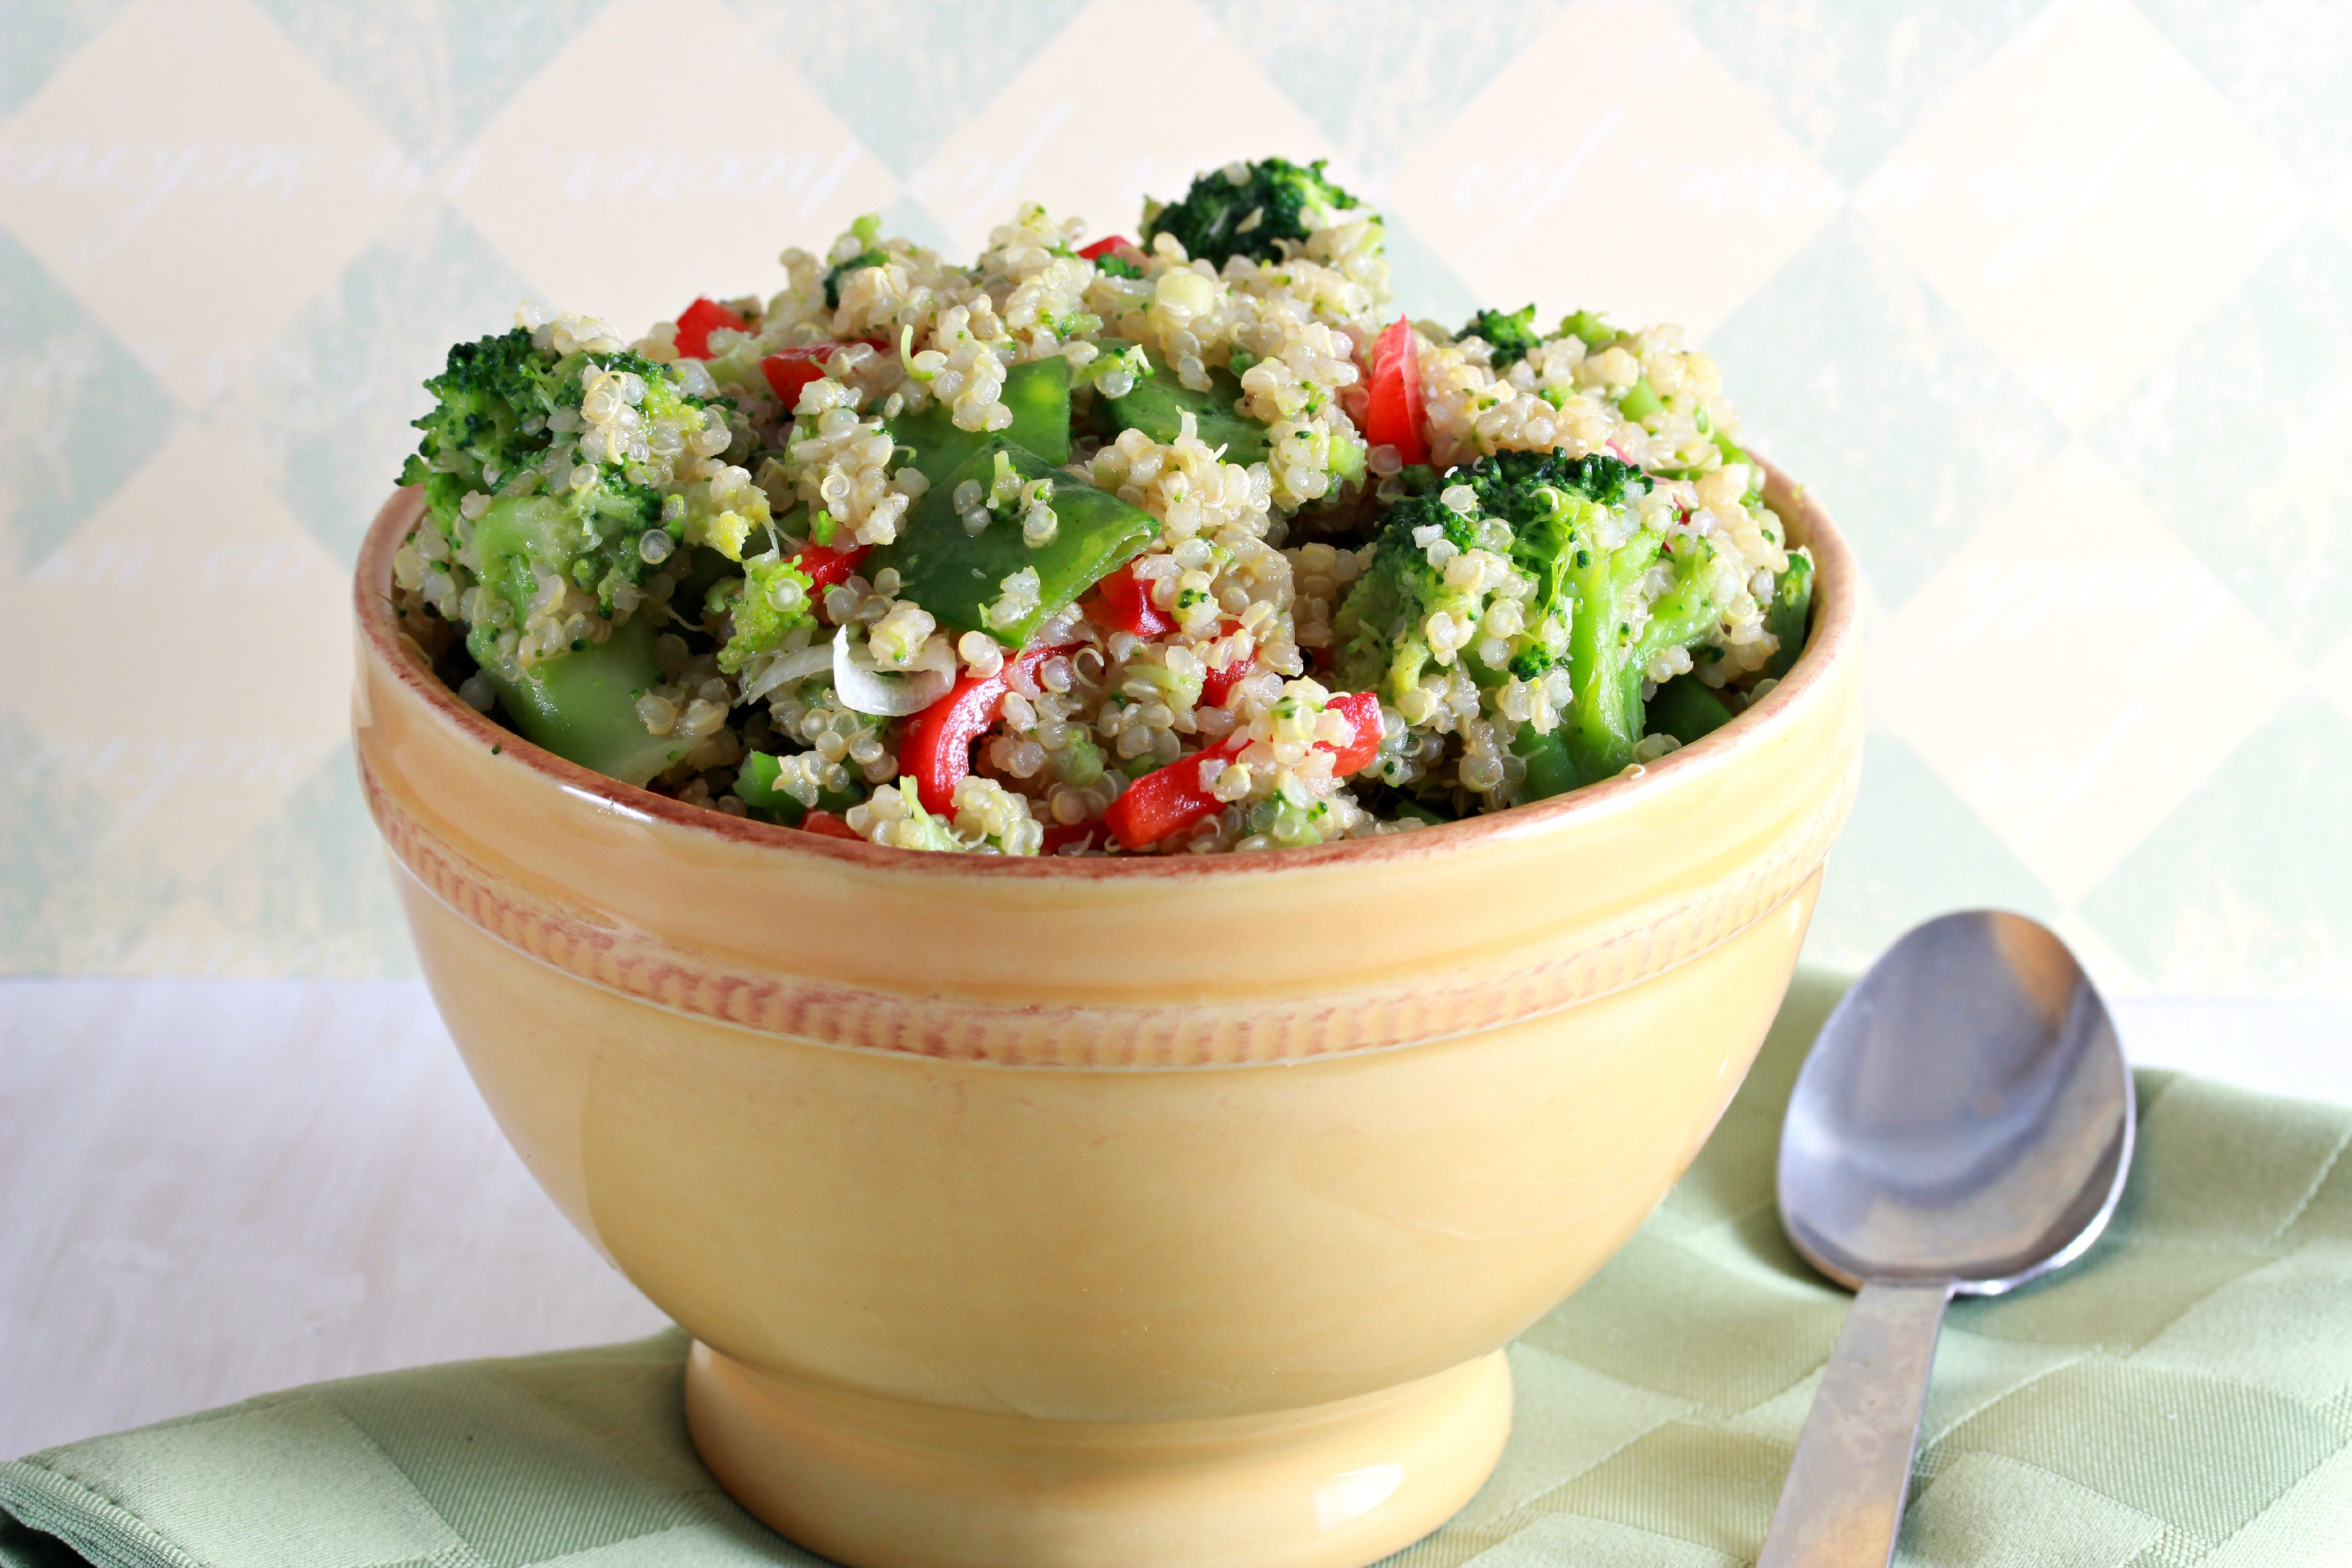 Summer salads: Broccoli and quinoa salad